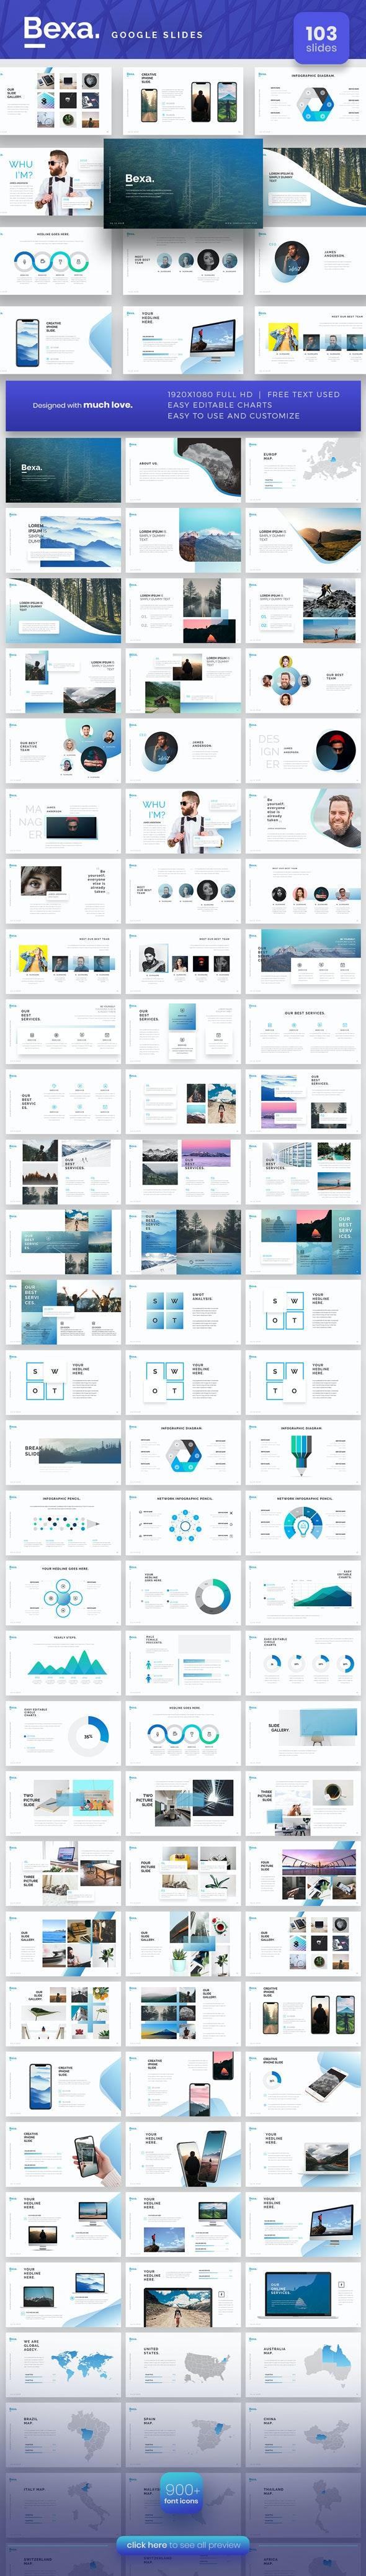 Bexa Google Slides Presentation Template - Google Slides Presentation Templates